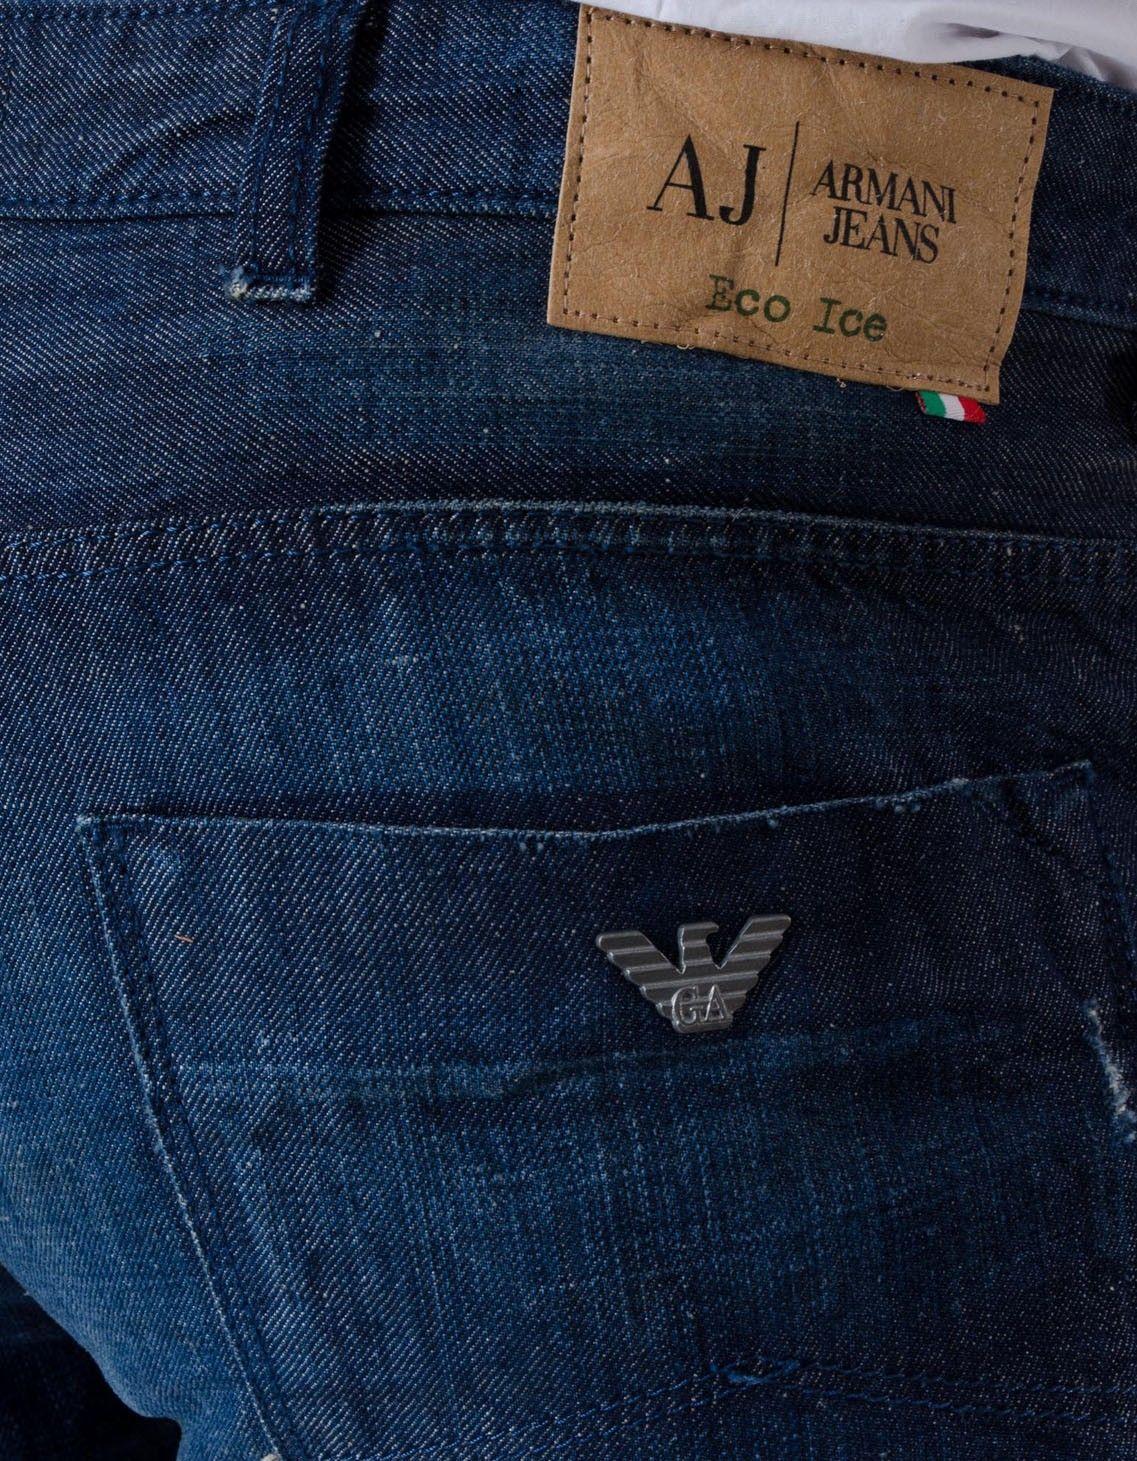 ca6515770 Jeans Masculino, Etiqueta De Couro, Calça Jeans, Jeans De Denim, Design De